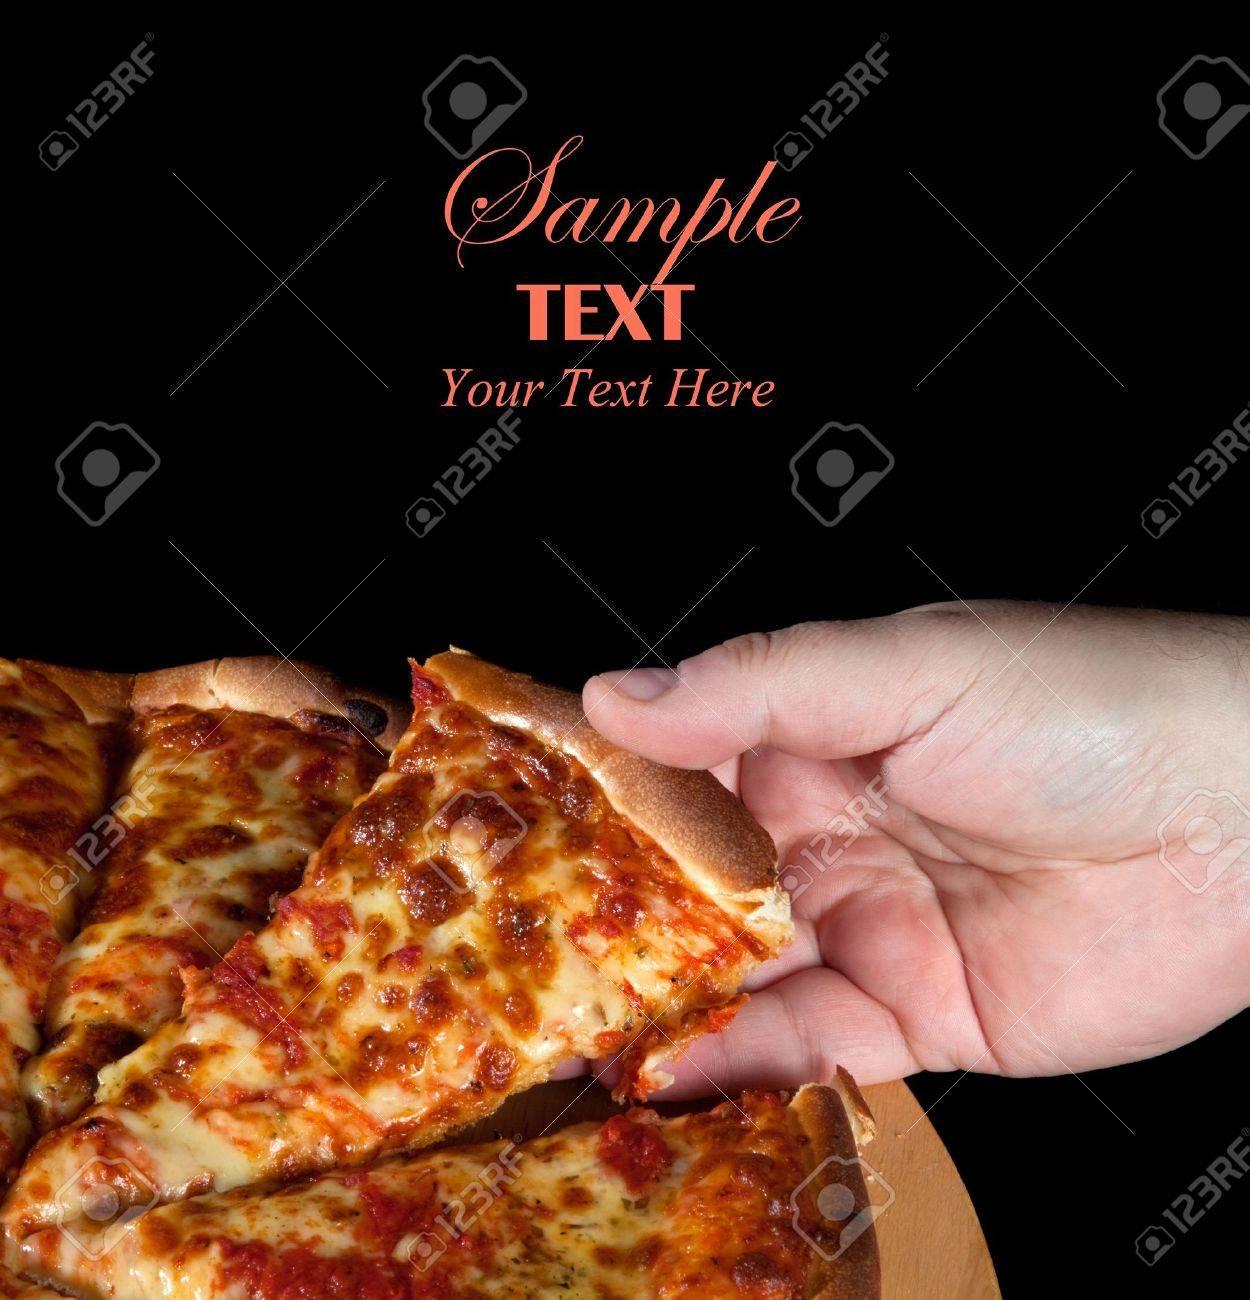 Whole Margharita Pizza over black background Stock Photo - 6200214